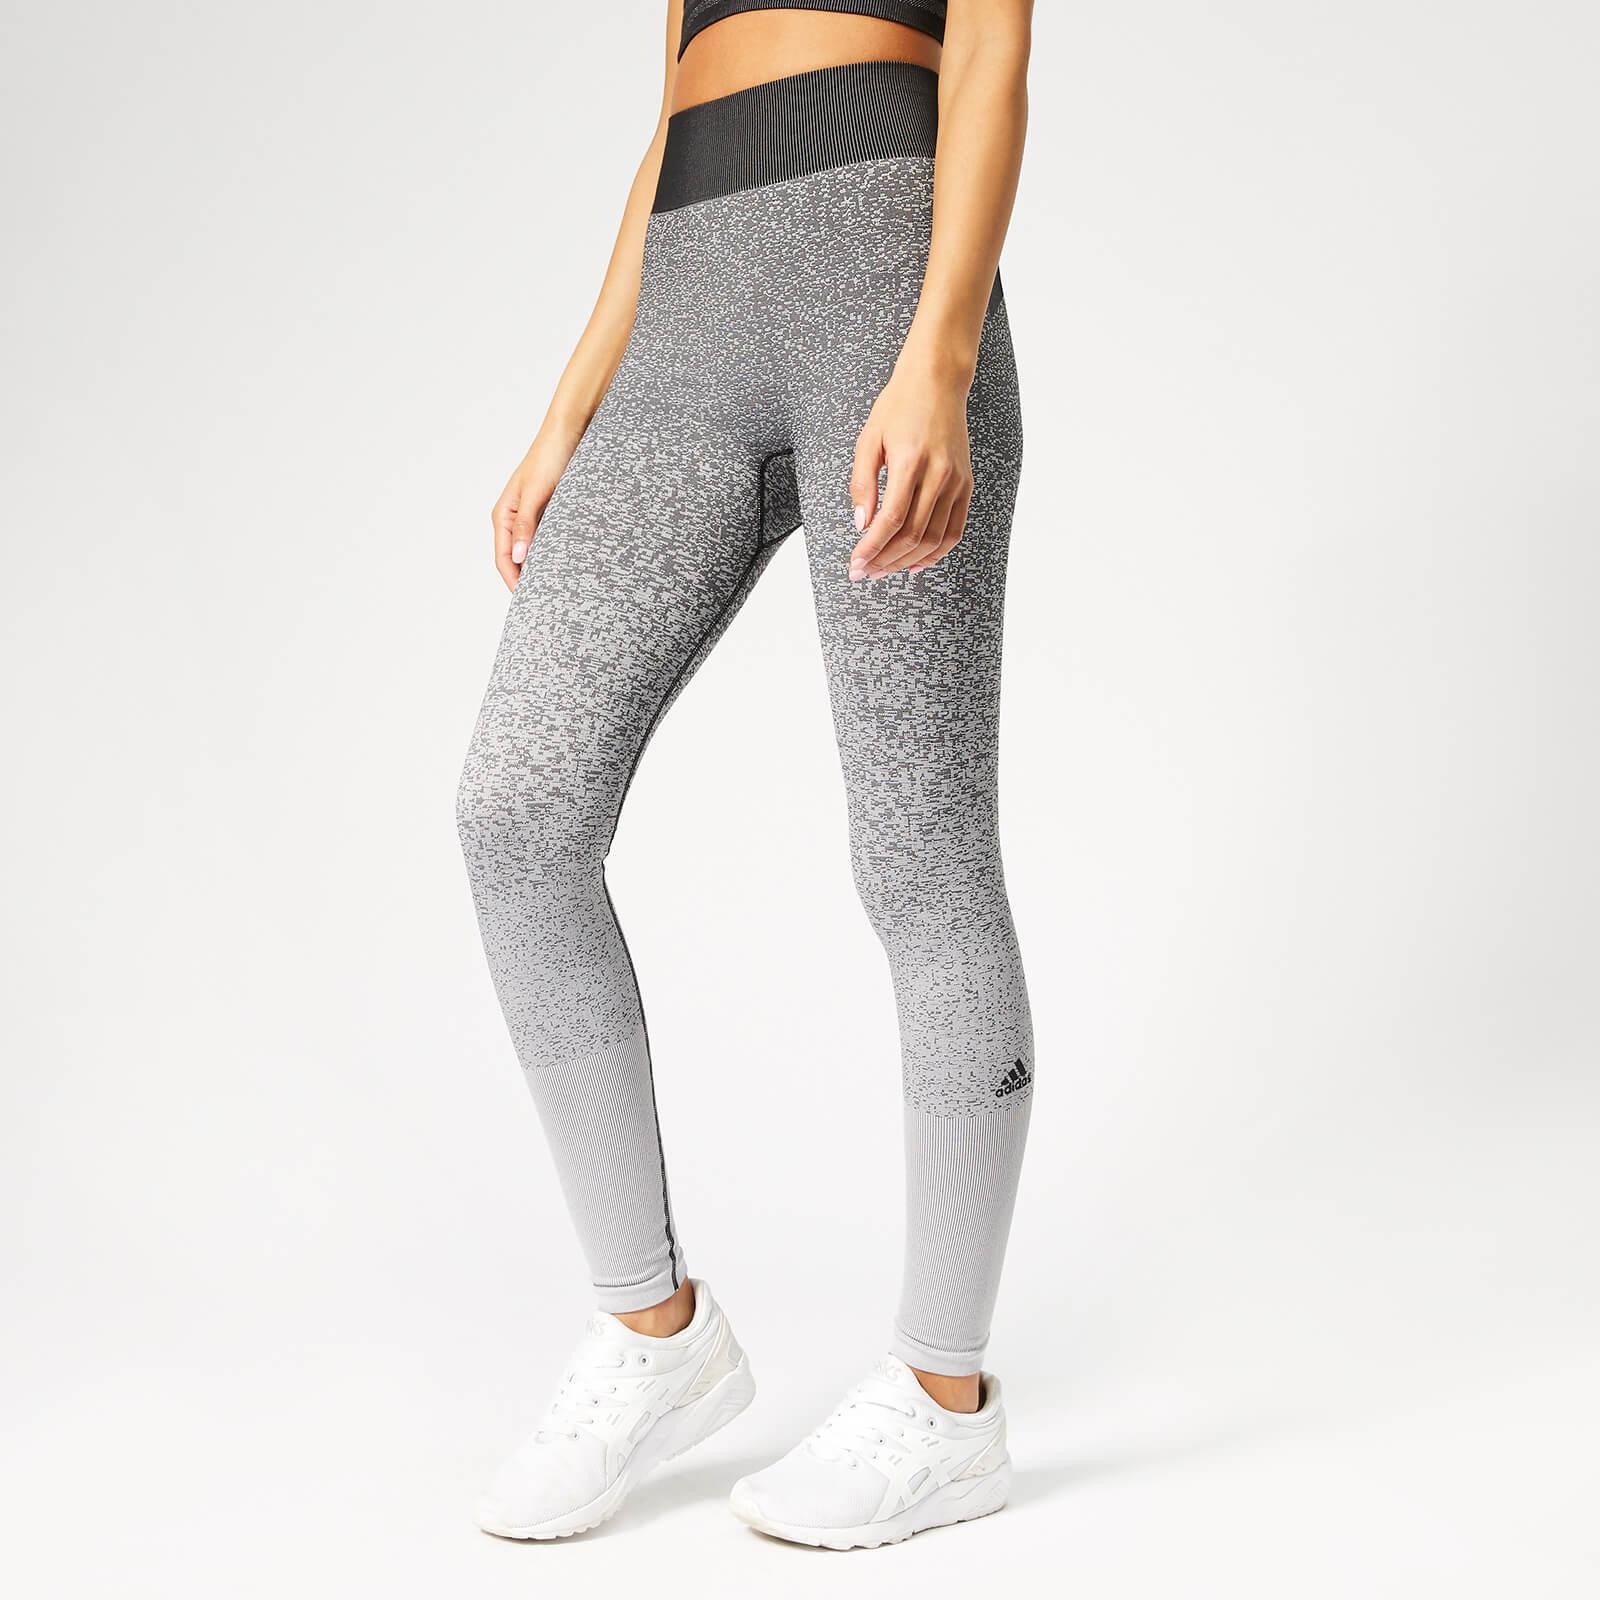 9c2e81f8fadafa adidas Women's Believe This Primeknit FLW Tights - Black/White |  ProBikeKit.com